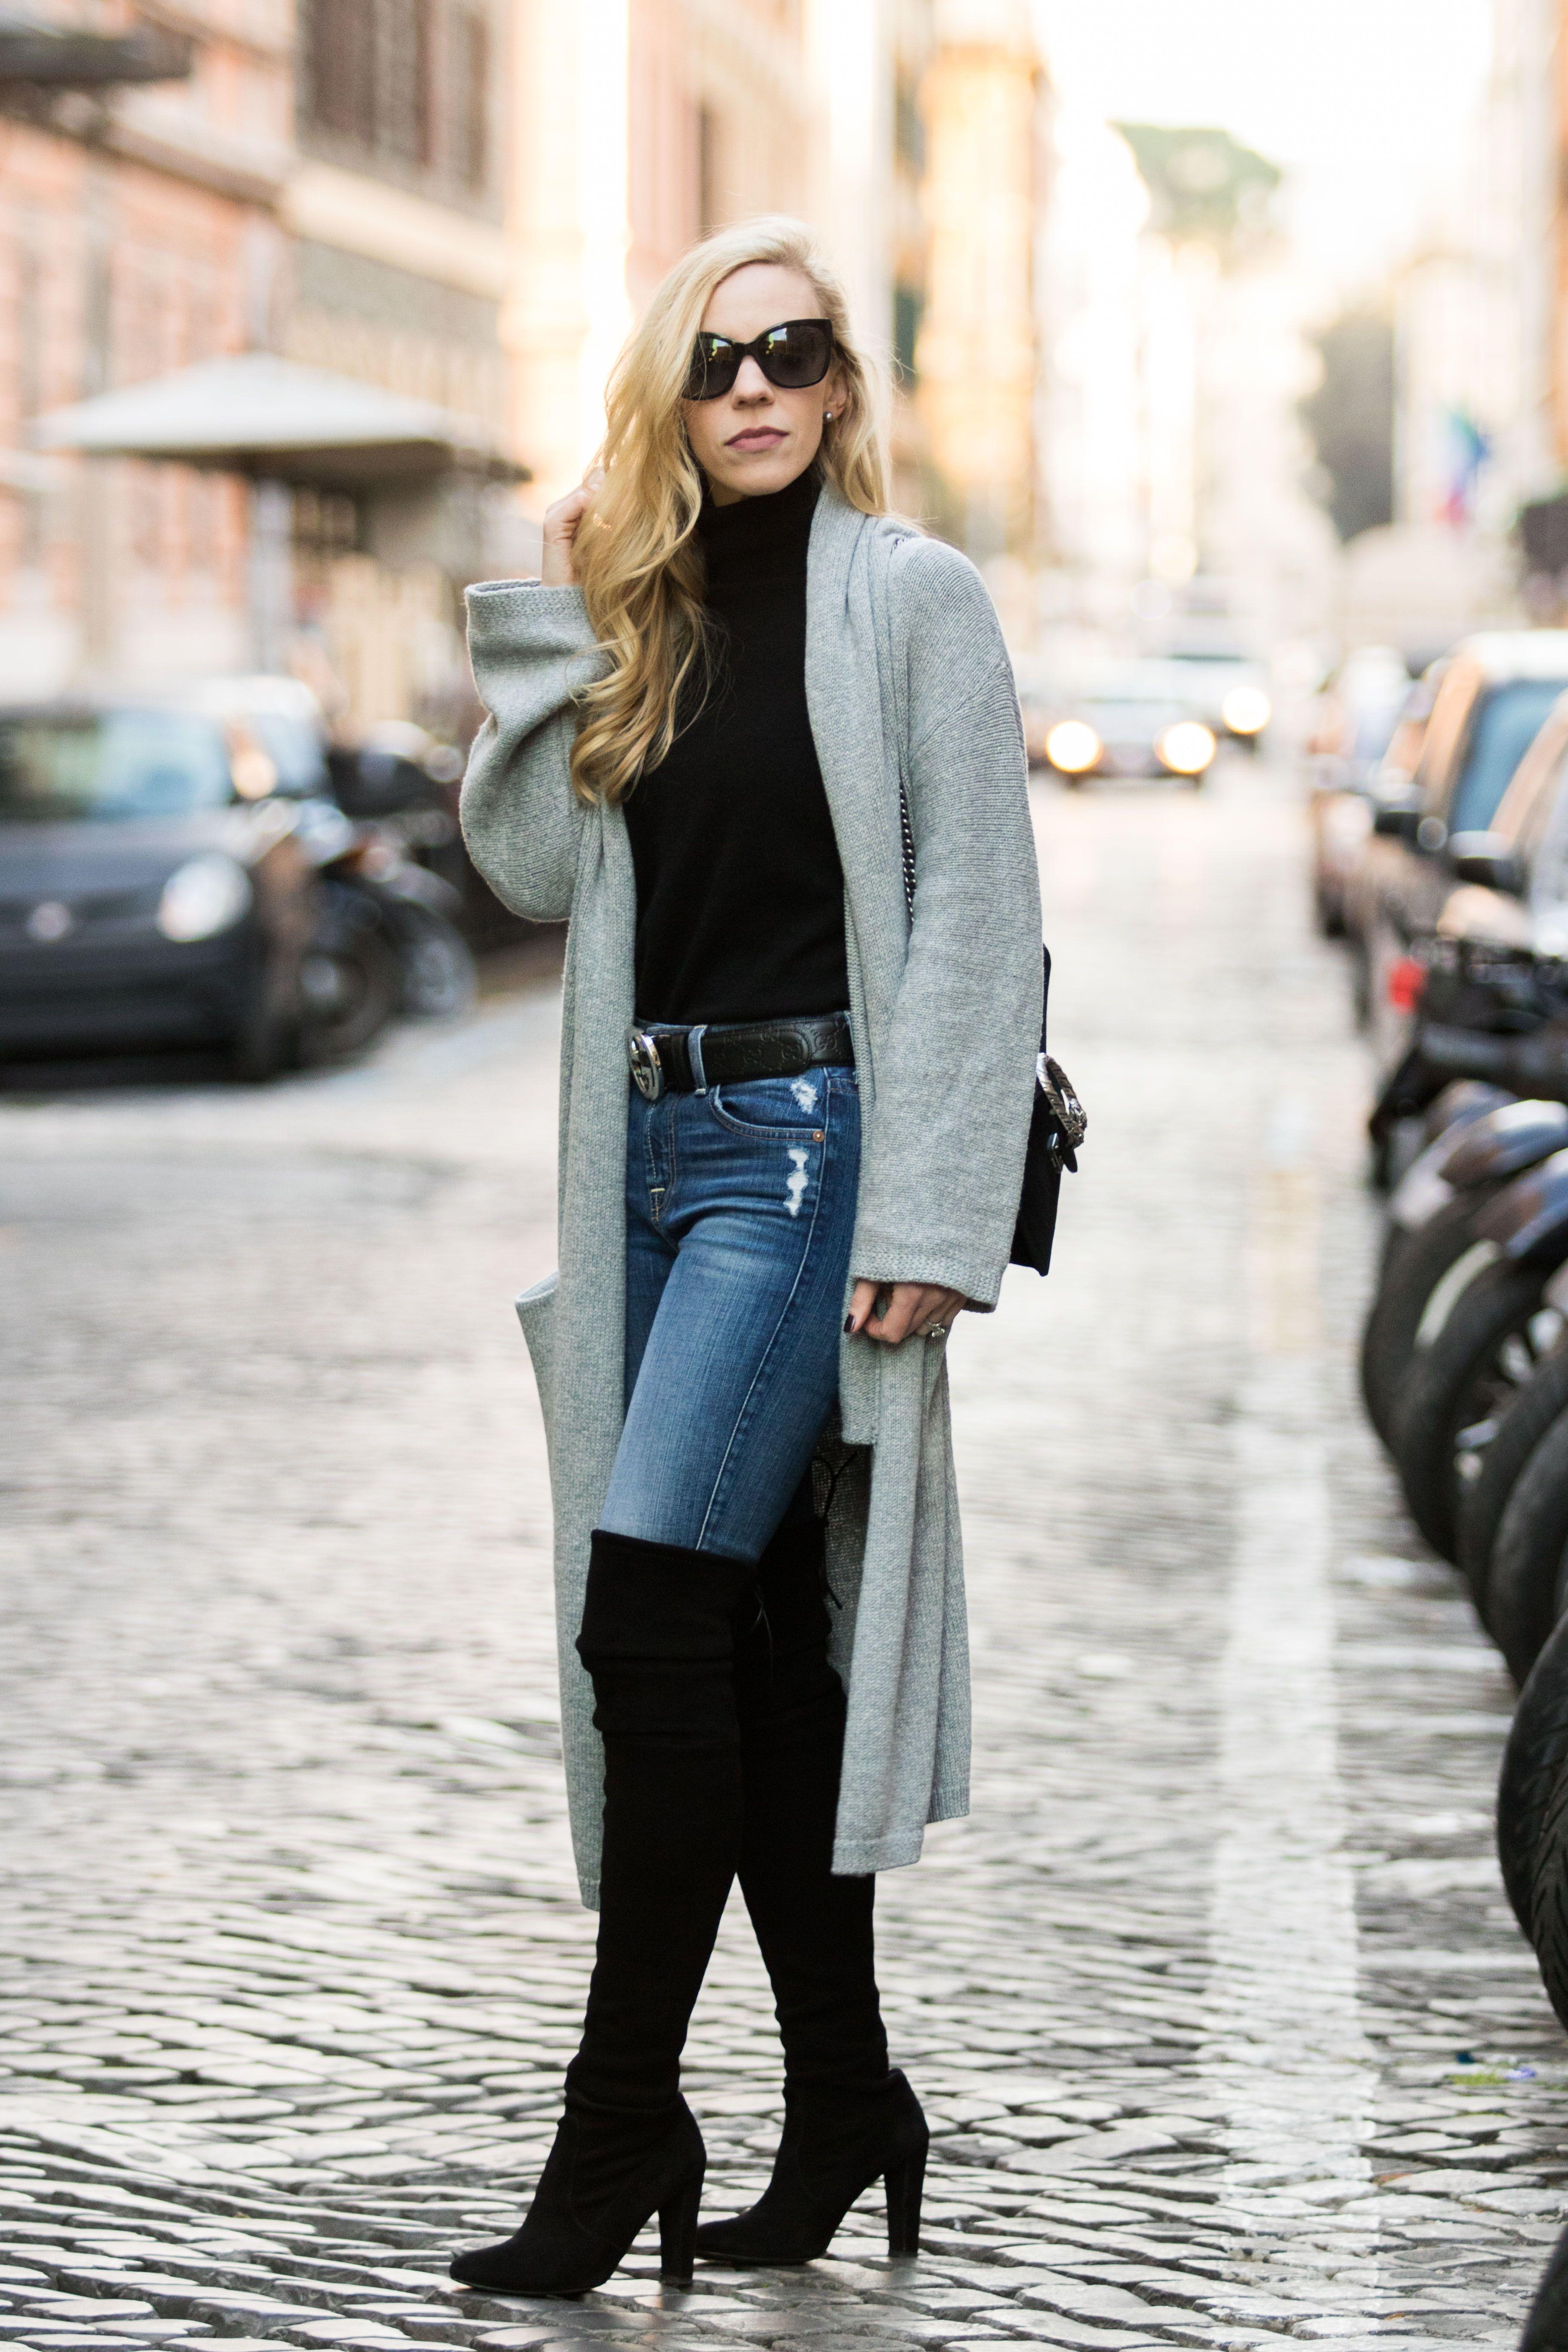 Rome Street Style Long Gray Cardigan With Black Turtleneck Gucci Belt And Stuart Weitzman